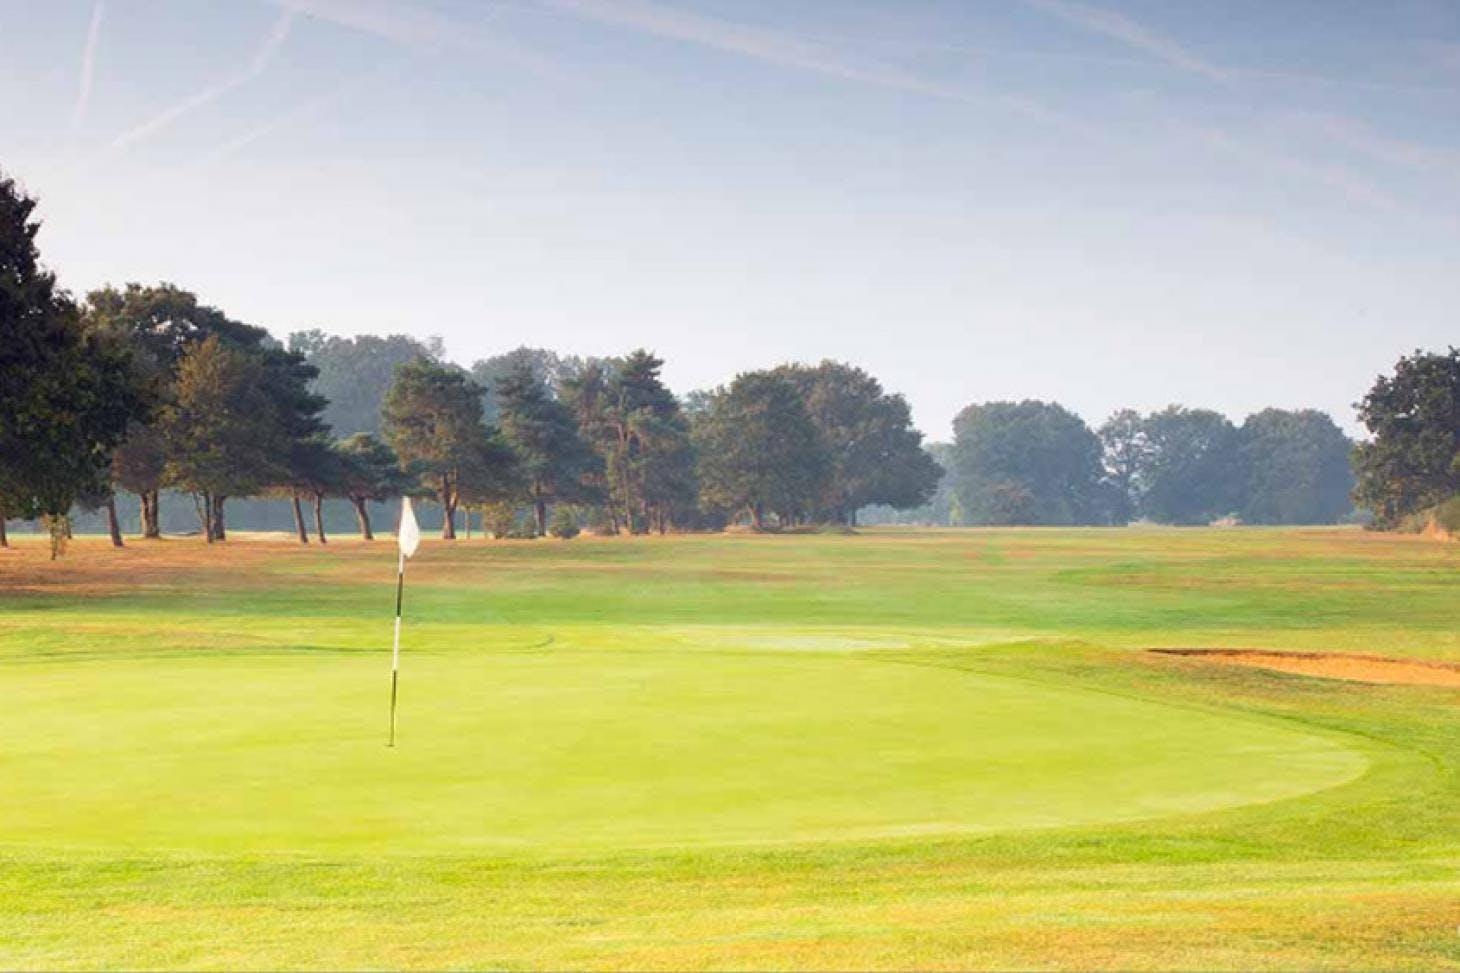 Maidenhead Golf Club 18 hole | Yes golf course